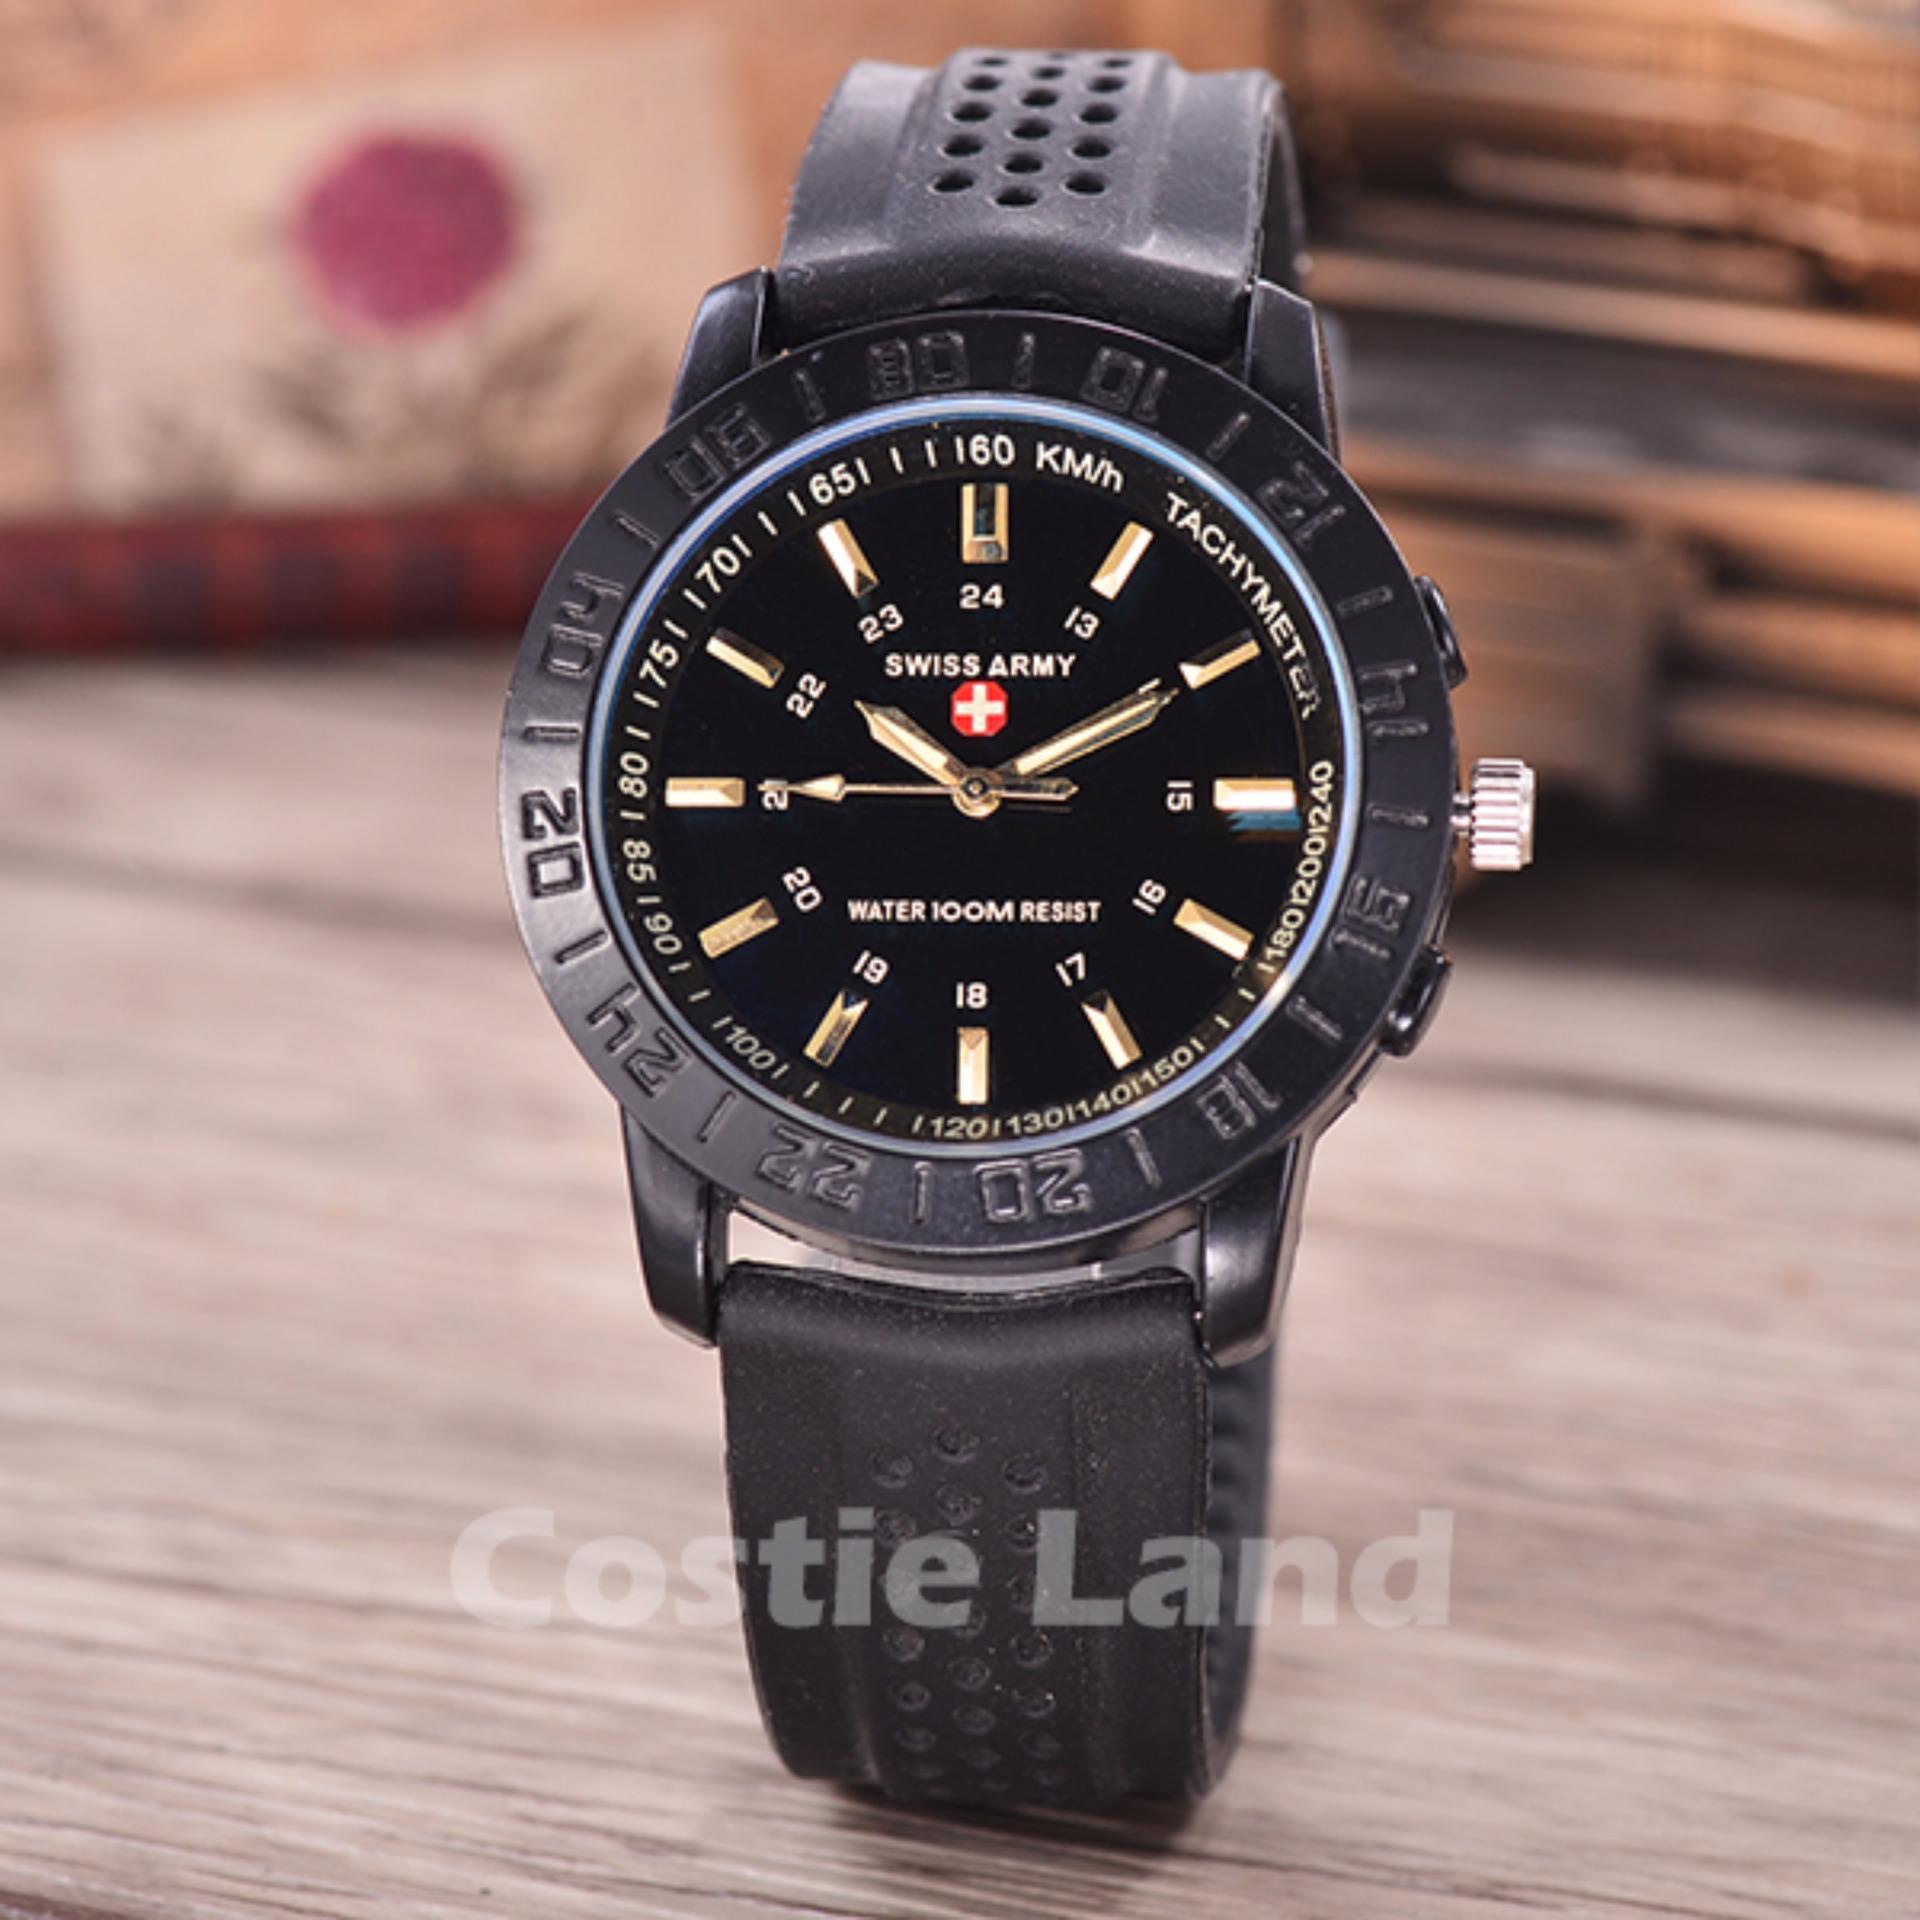 Lasebo Dual Time Jam Tangan Sport Pria Rubber Strap . Source · Swiss Army - Jam